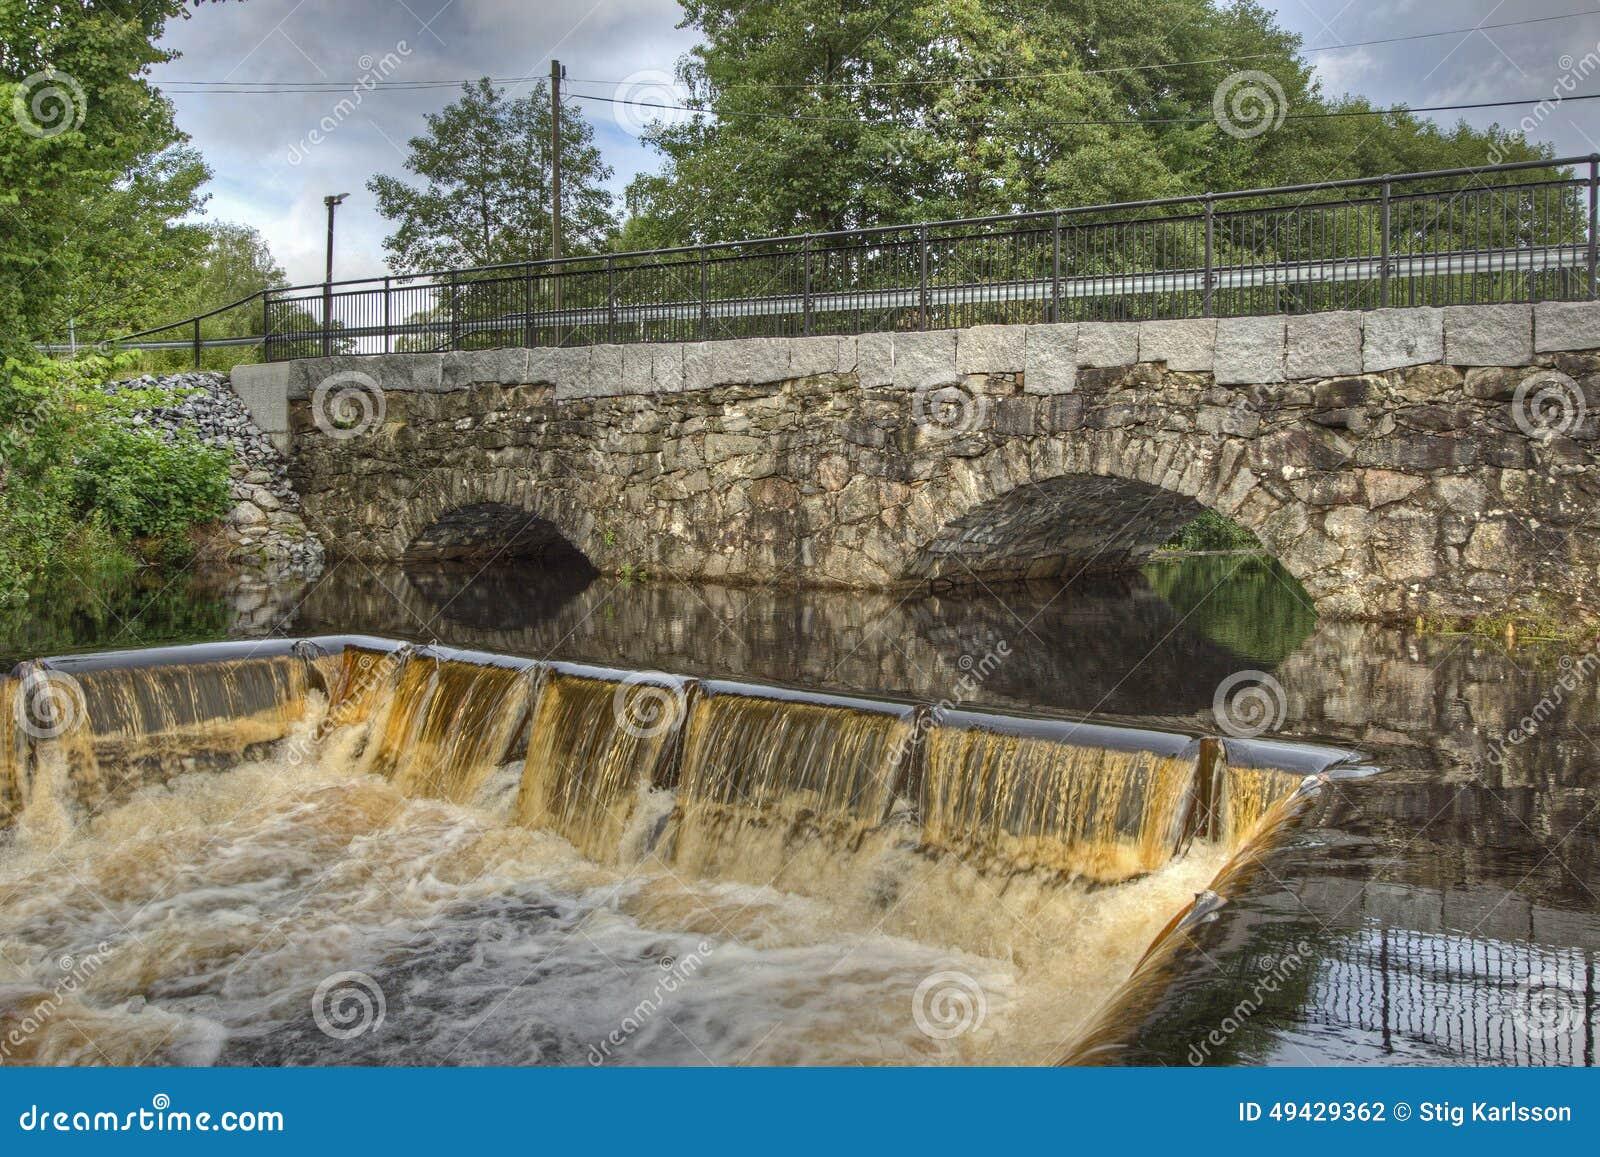 hdr old bridge and - photo #19